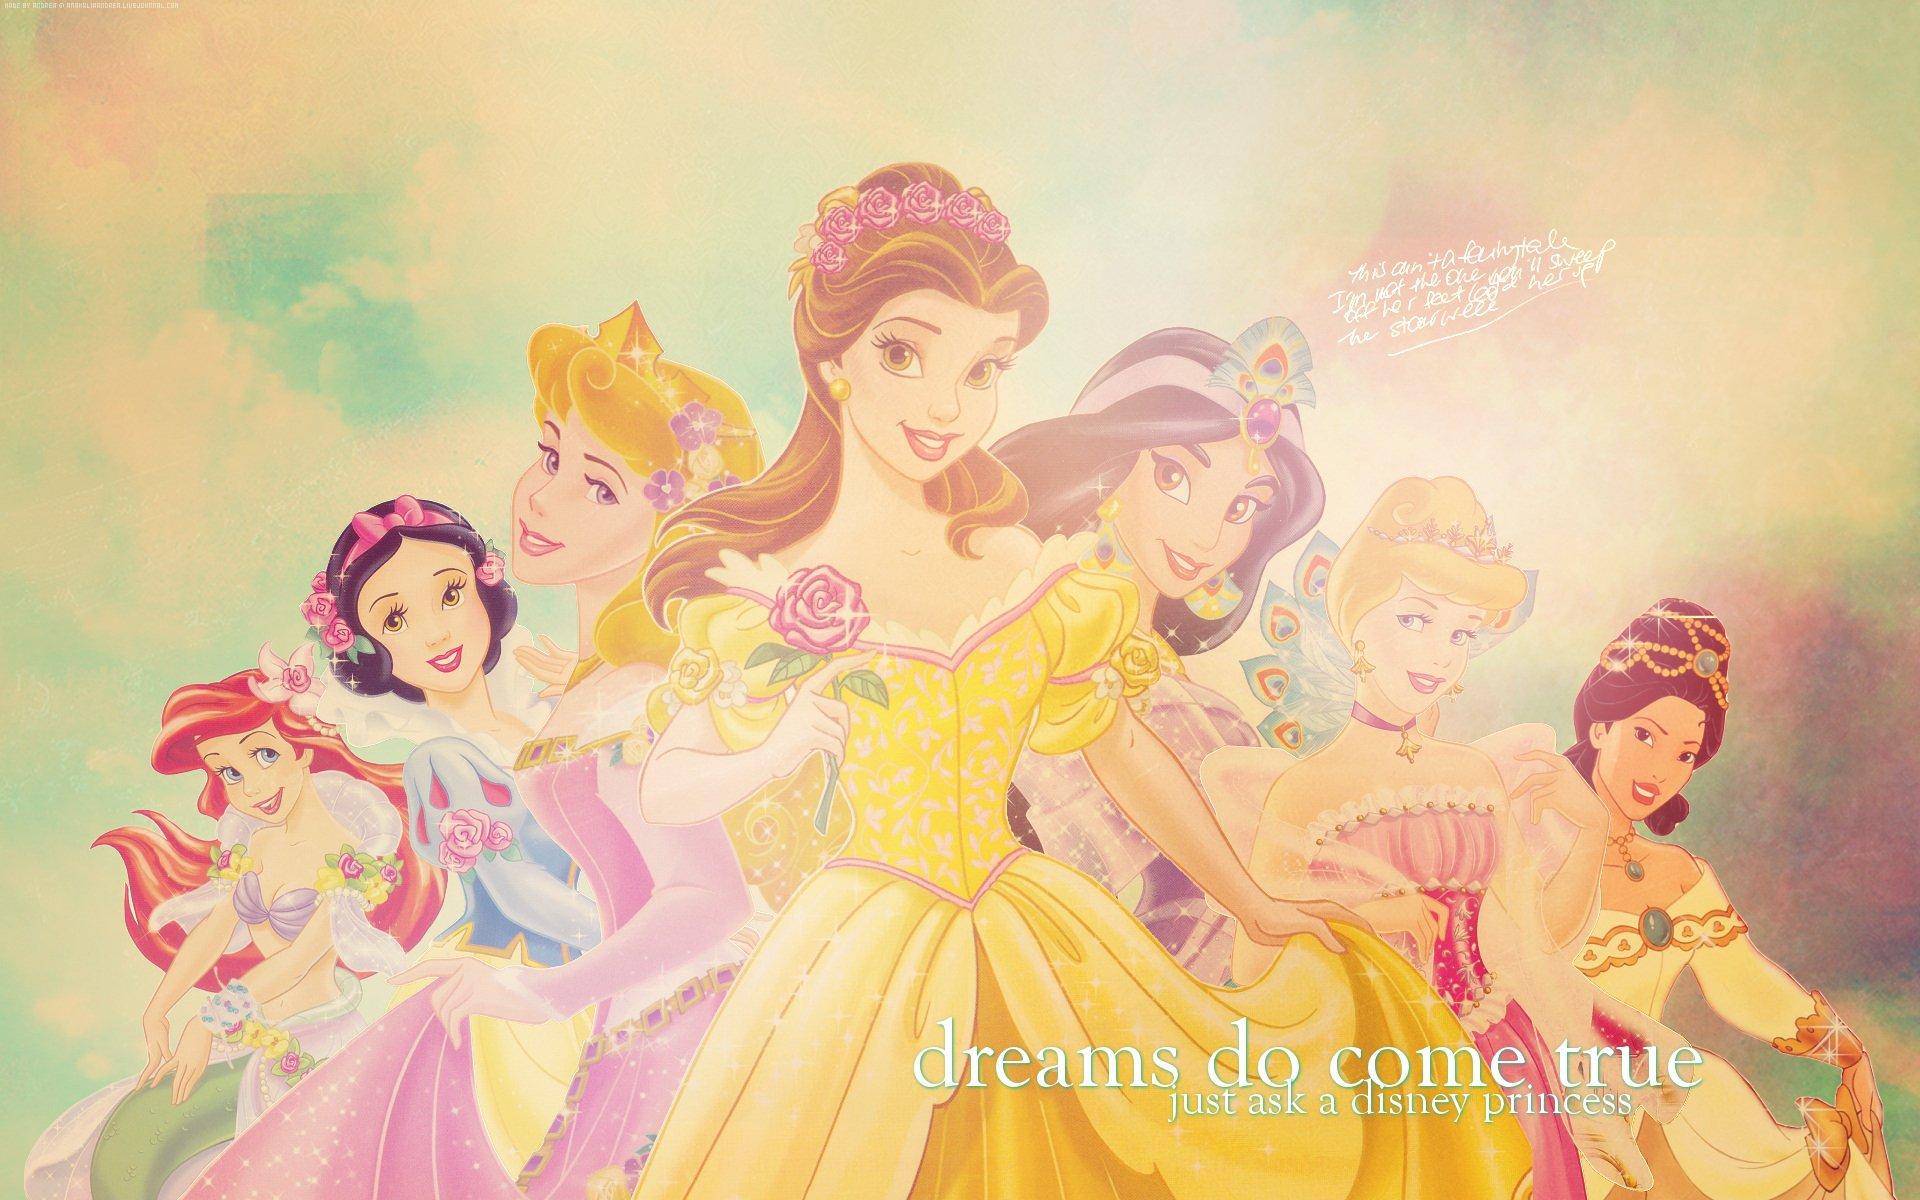 Disney Princess Wallpaper Hd 1920x1200